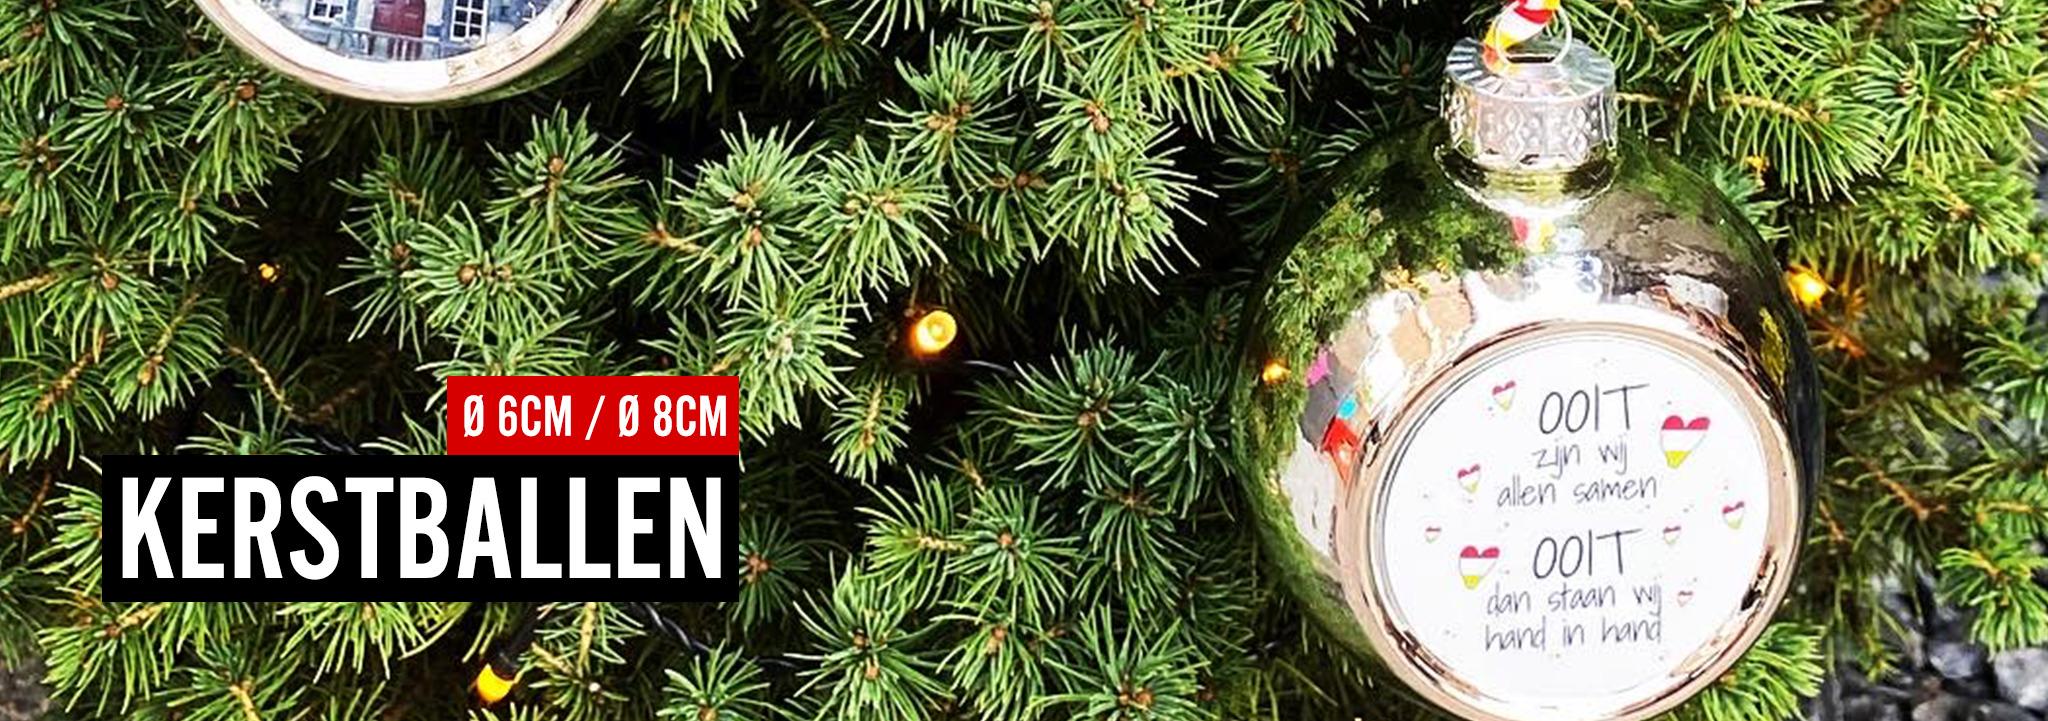 Oeteldonk Kerstbal